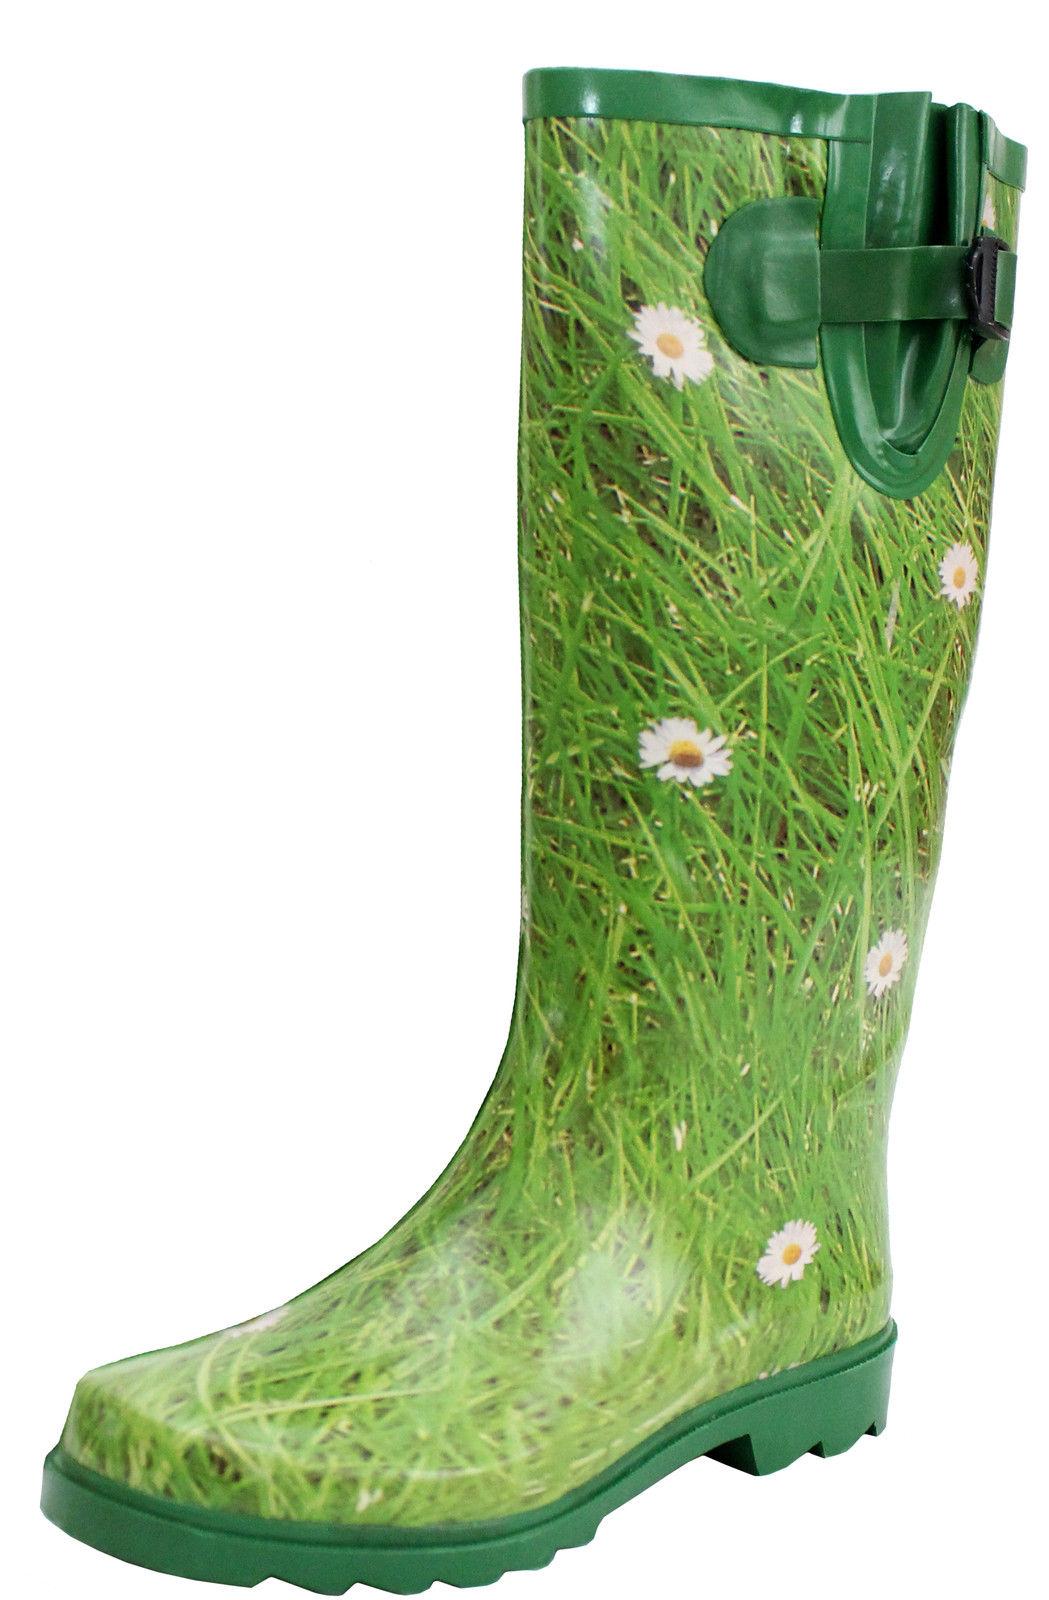 Original Clothing Shoes Amp Accessories Gt Women39s Shoes Gt Boots